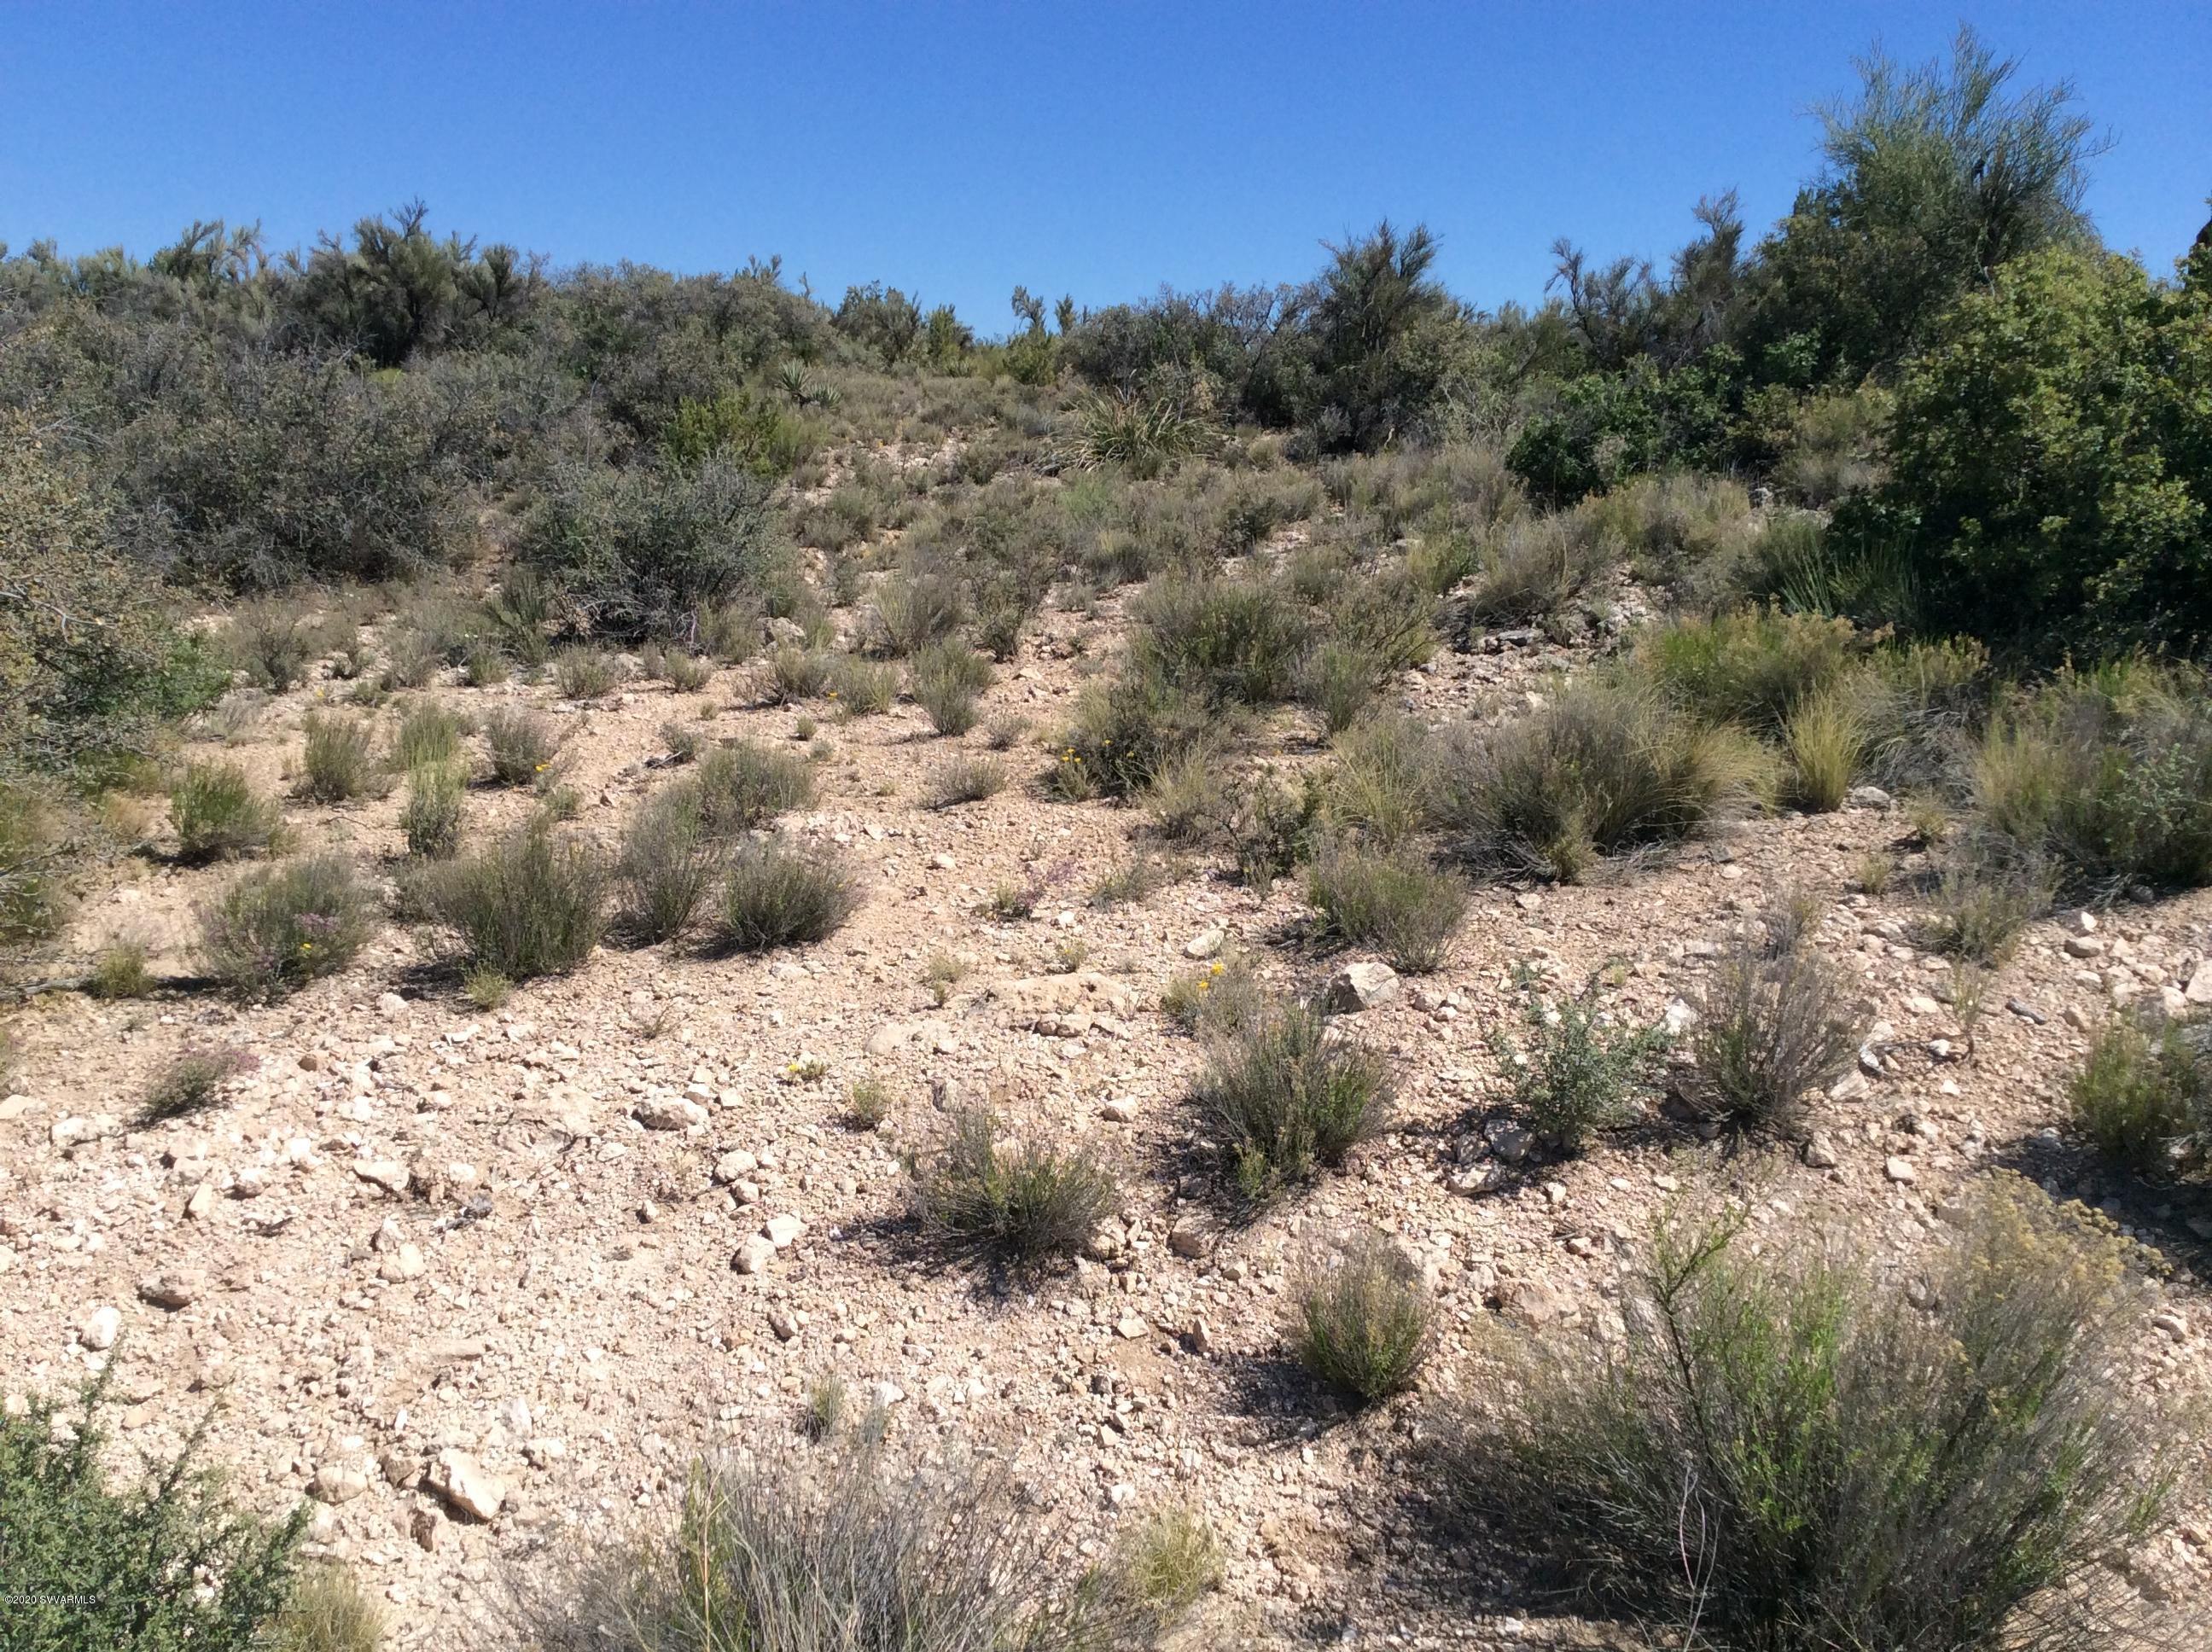 6450 N Canyon Rimrock, AZ 86335